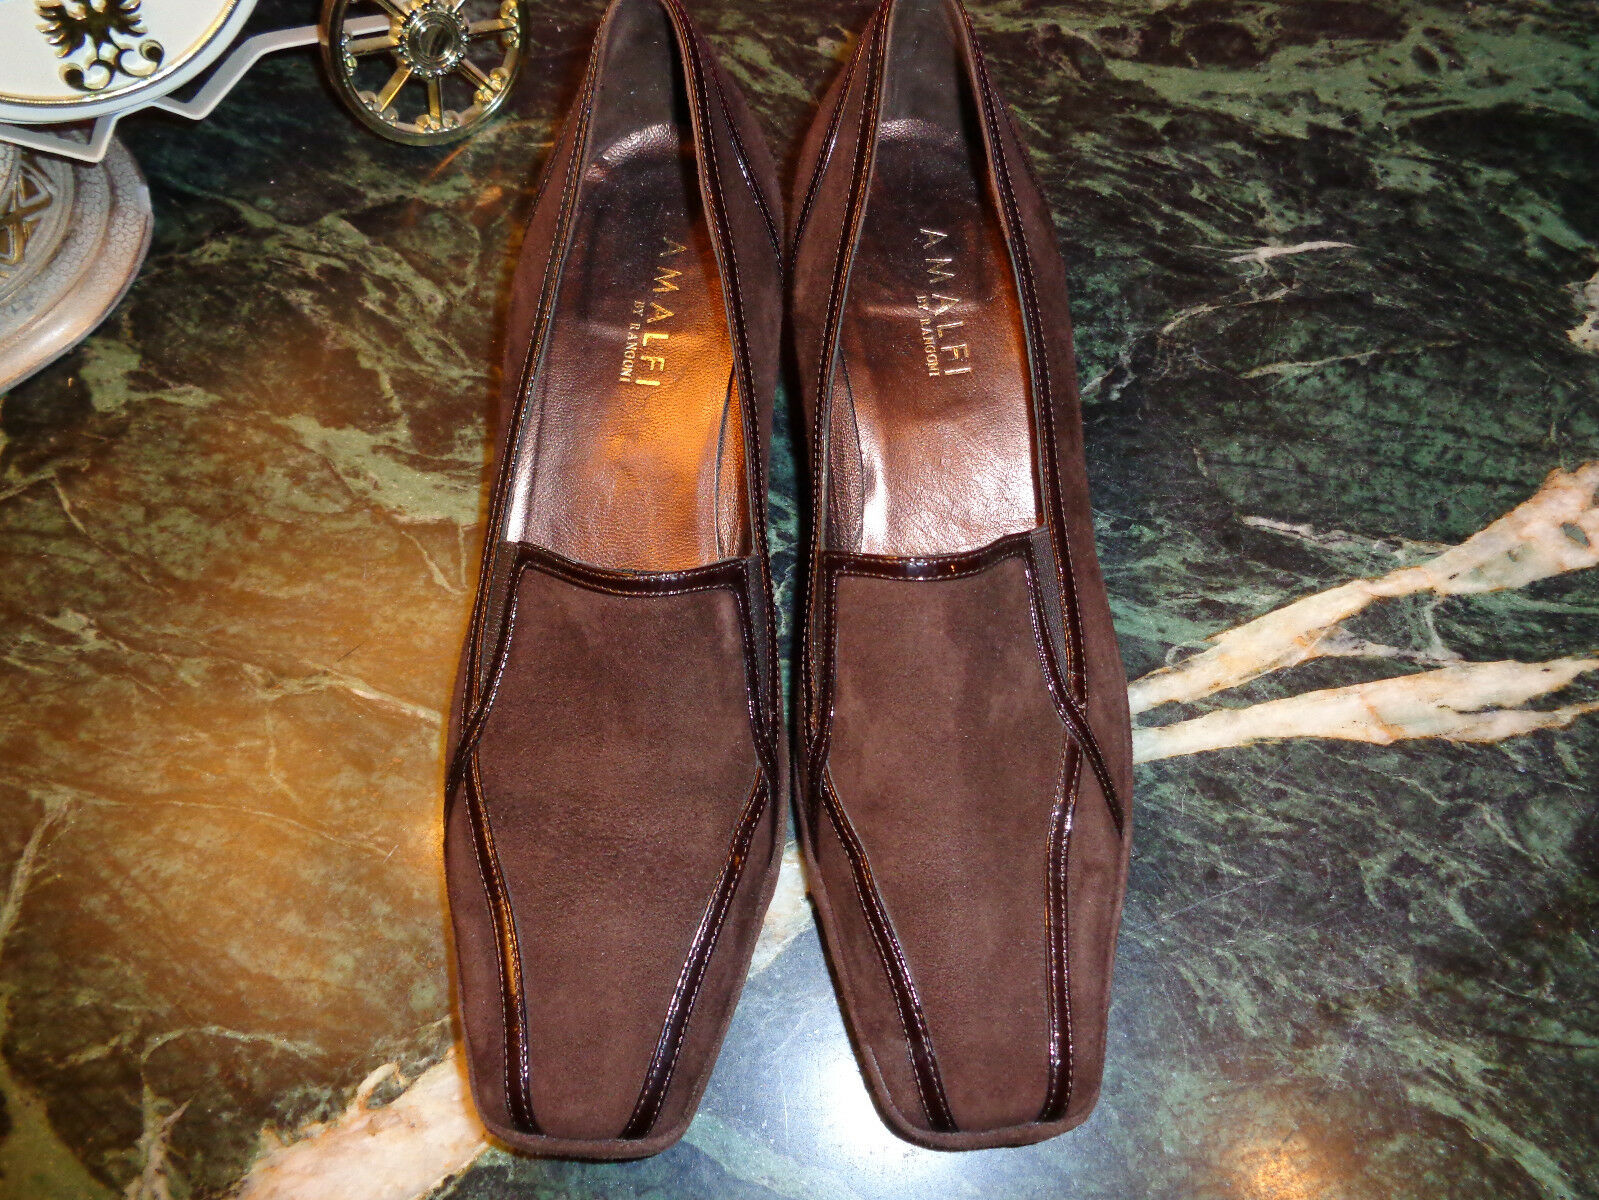 AMALFI brown suede w brown patent leather trim wedge shoe 9N PRISTINE